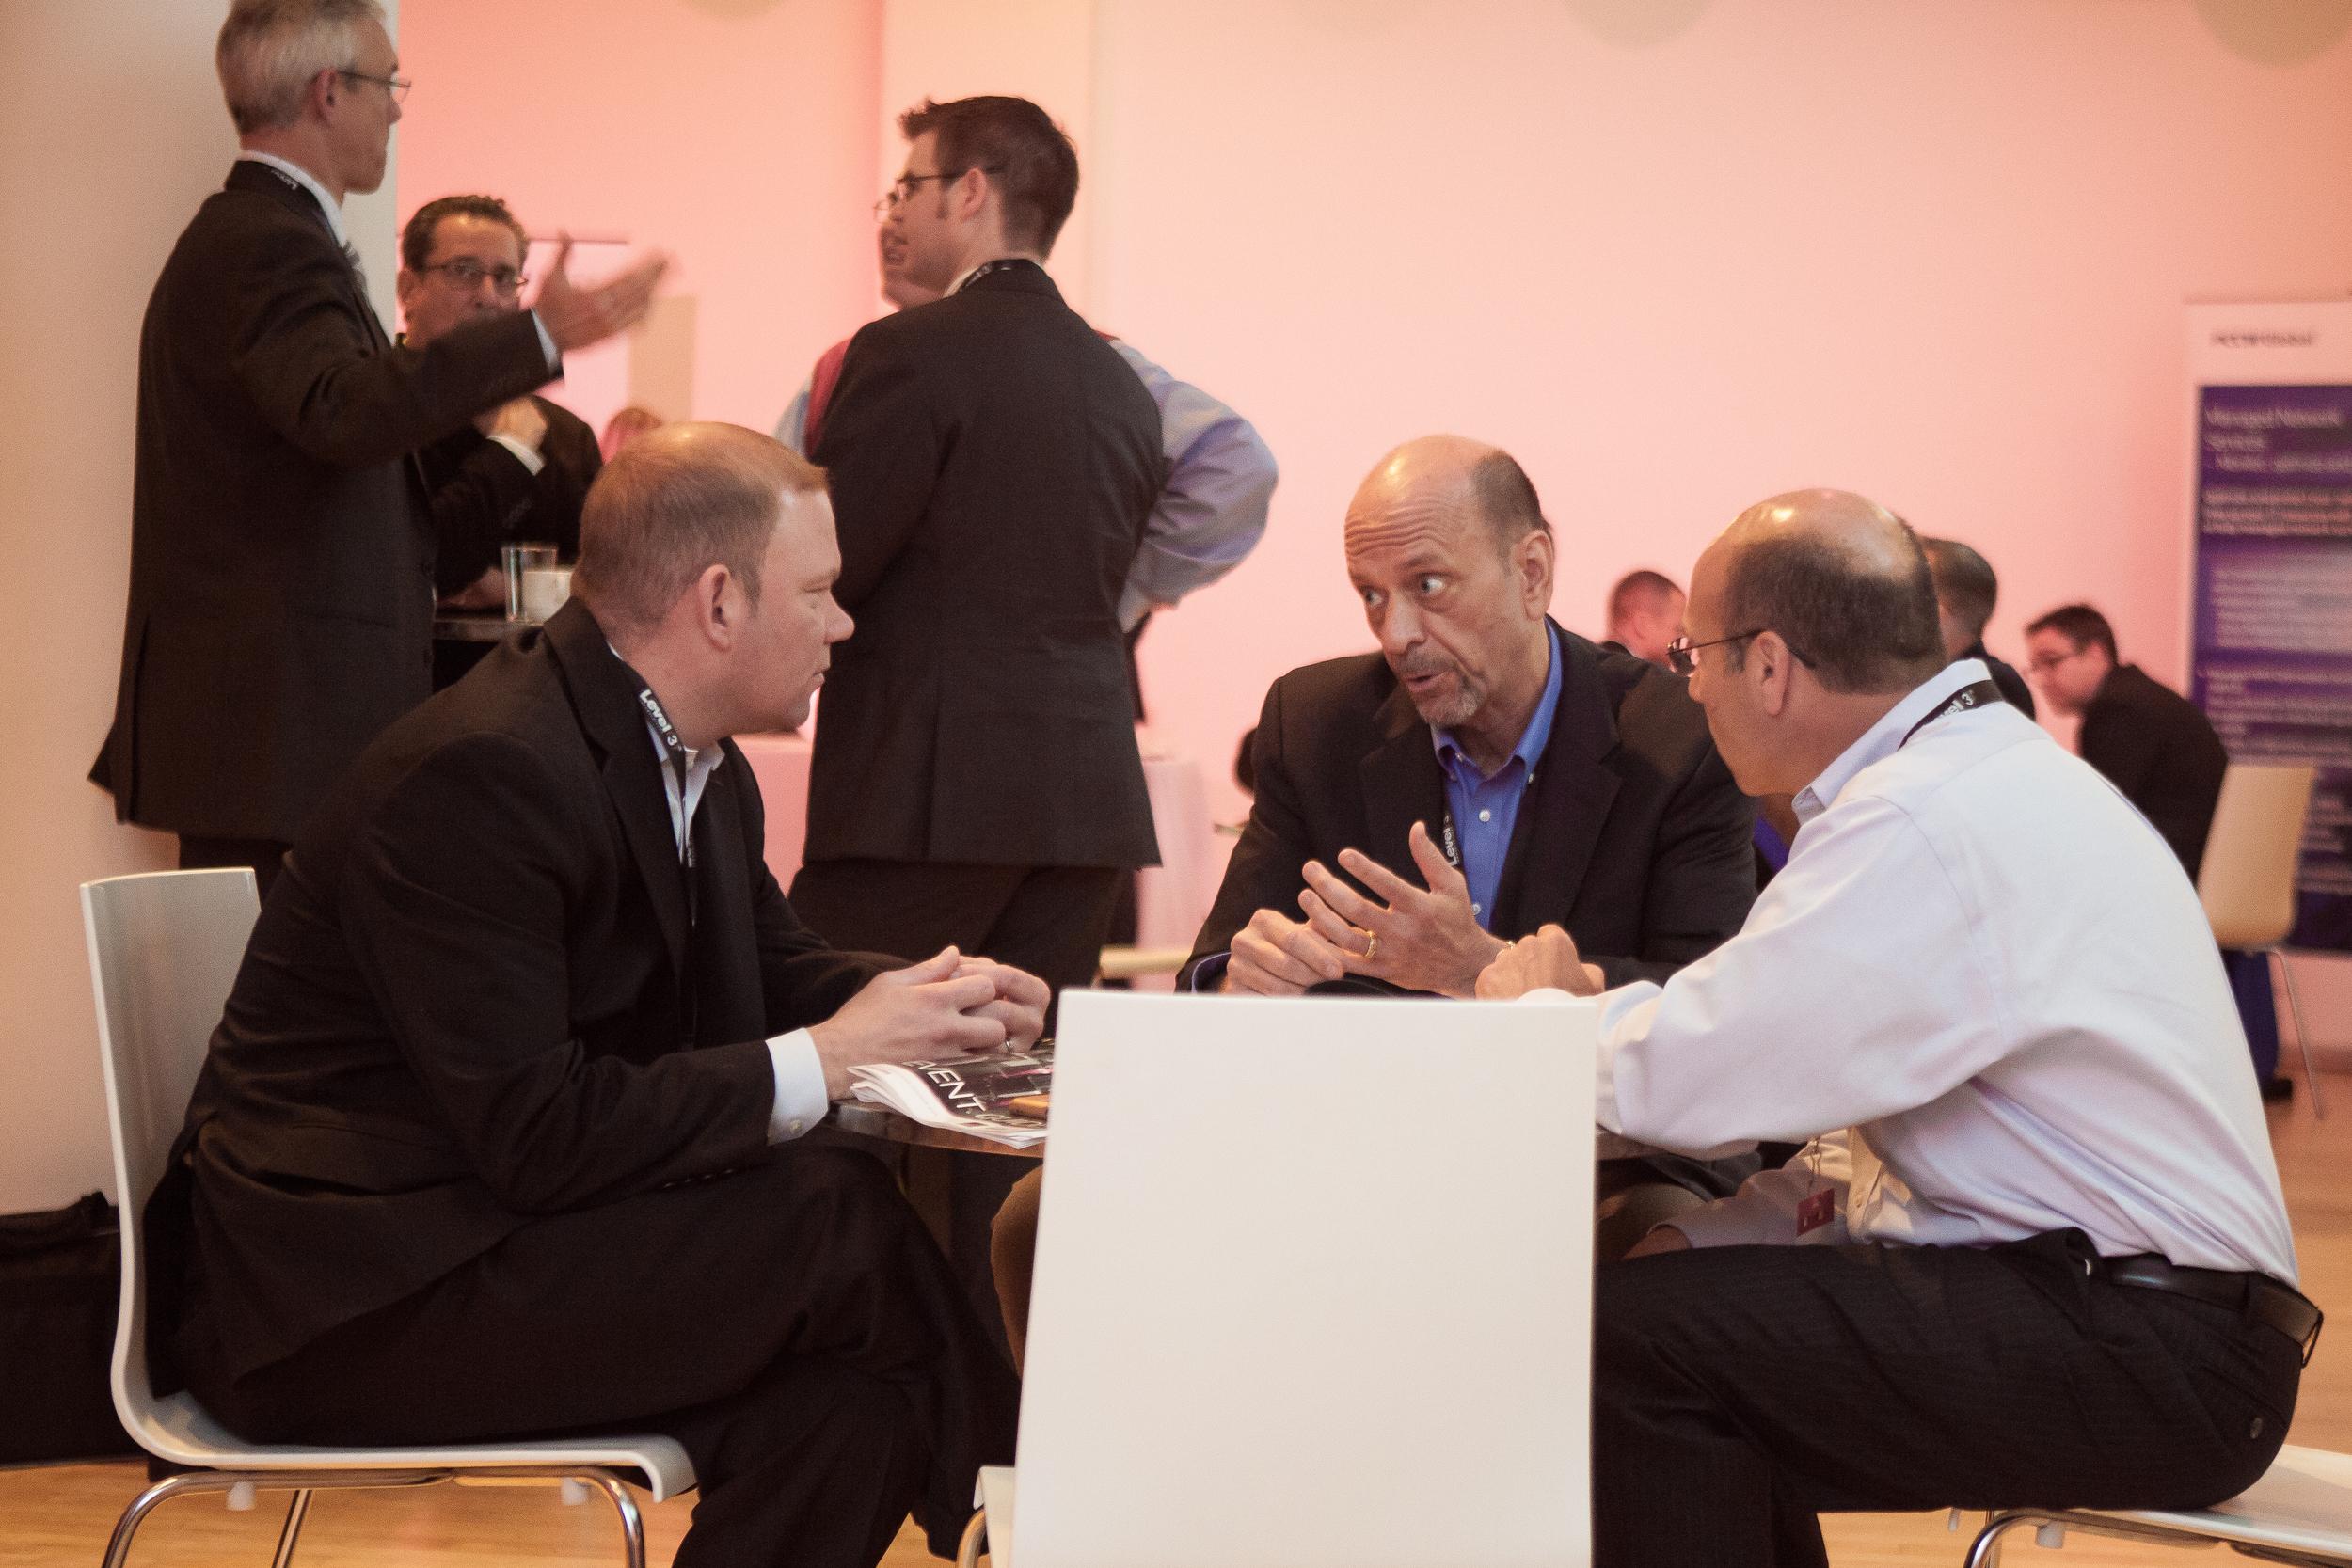 050-Capacity_Conferences-WAN_Summit-042715-IMG_0424.jpg